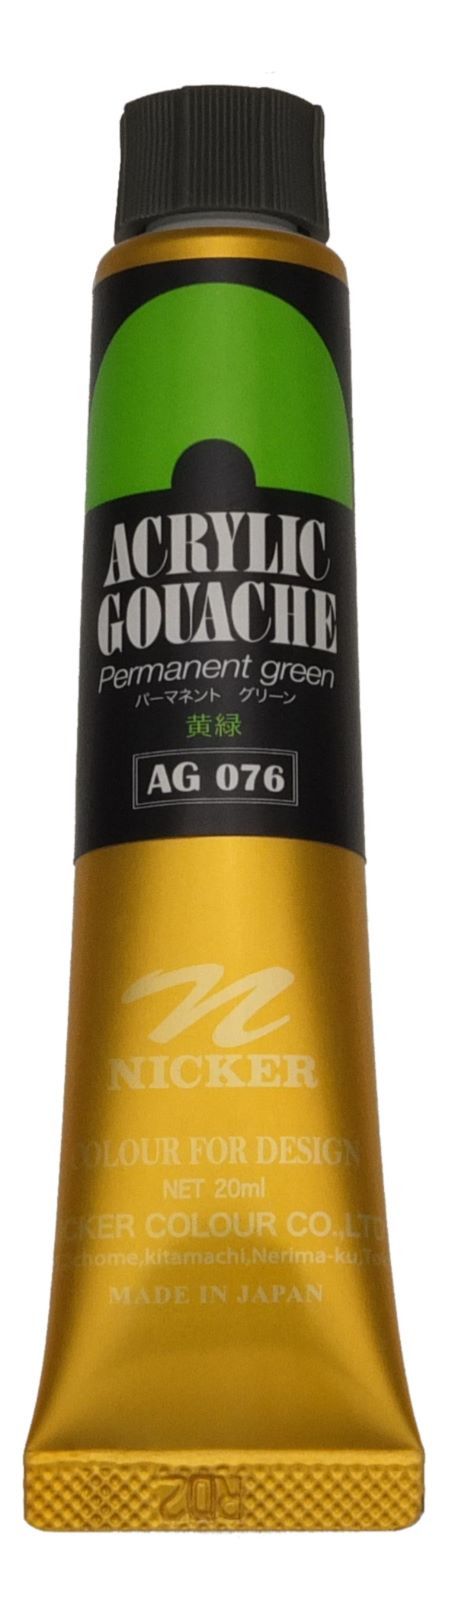 ACRYLIC GOUACHE 20ml AG076  PERMANENT GREEN